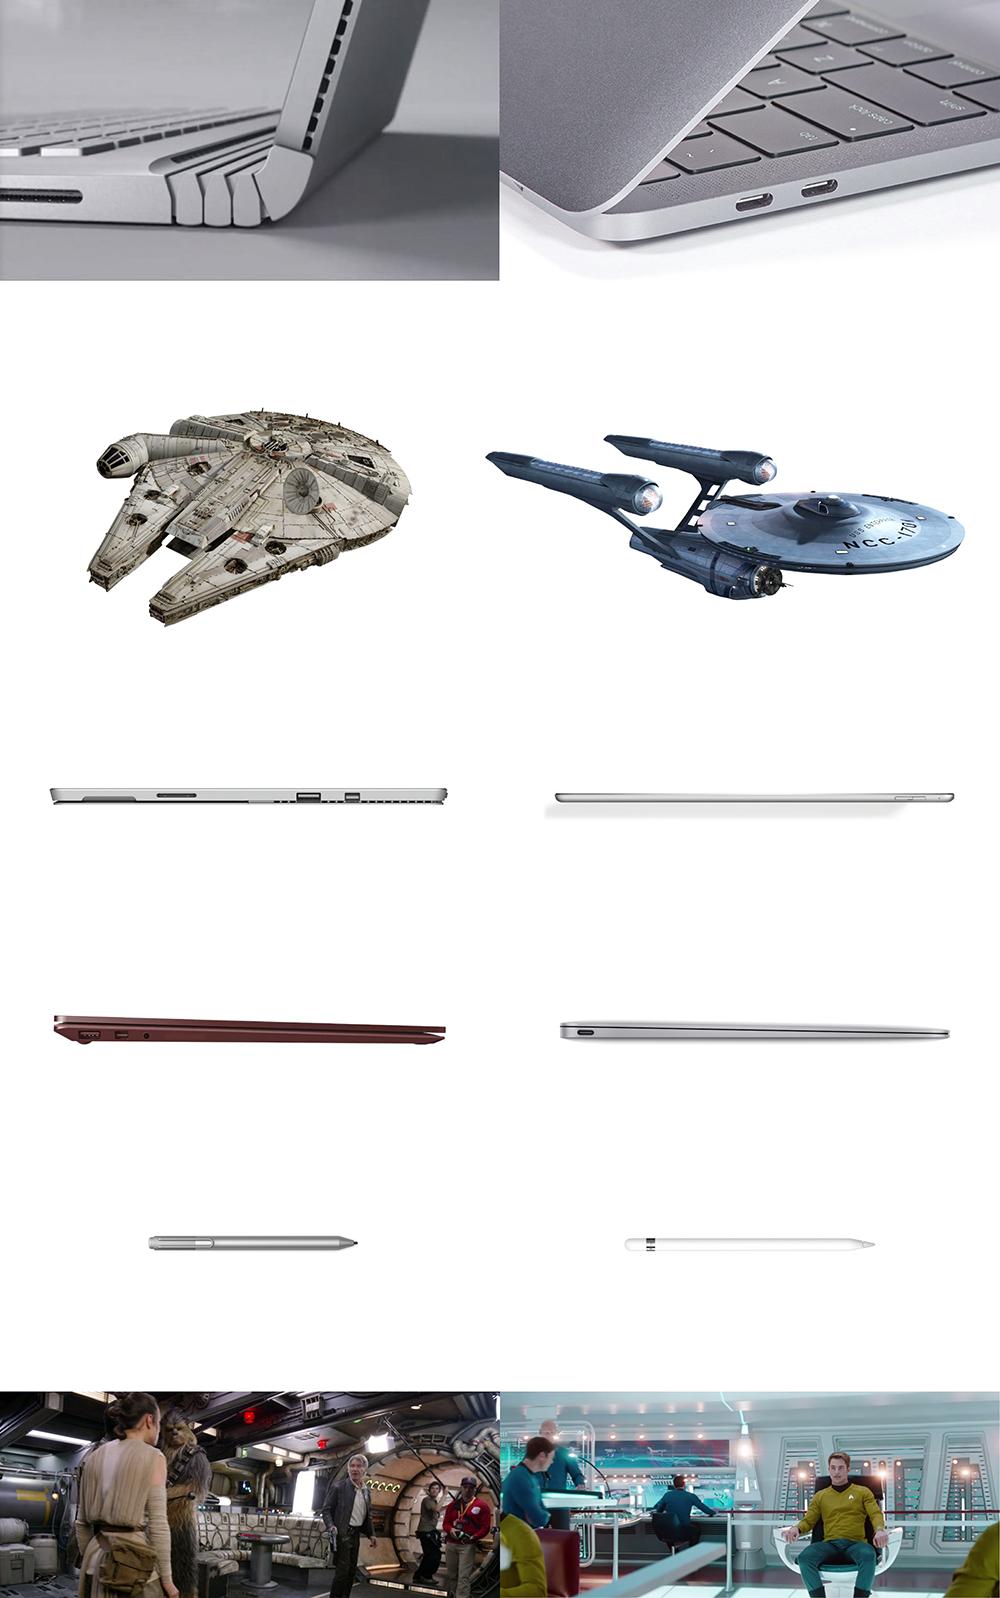 Microsoft is Star Wars, Apple is Star Trek